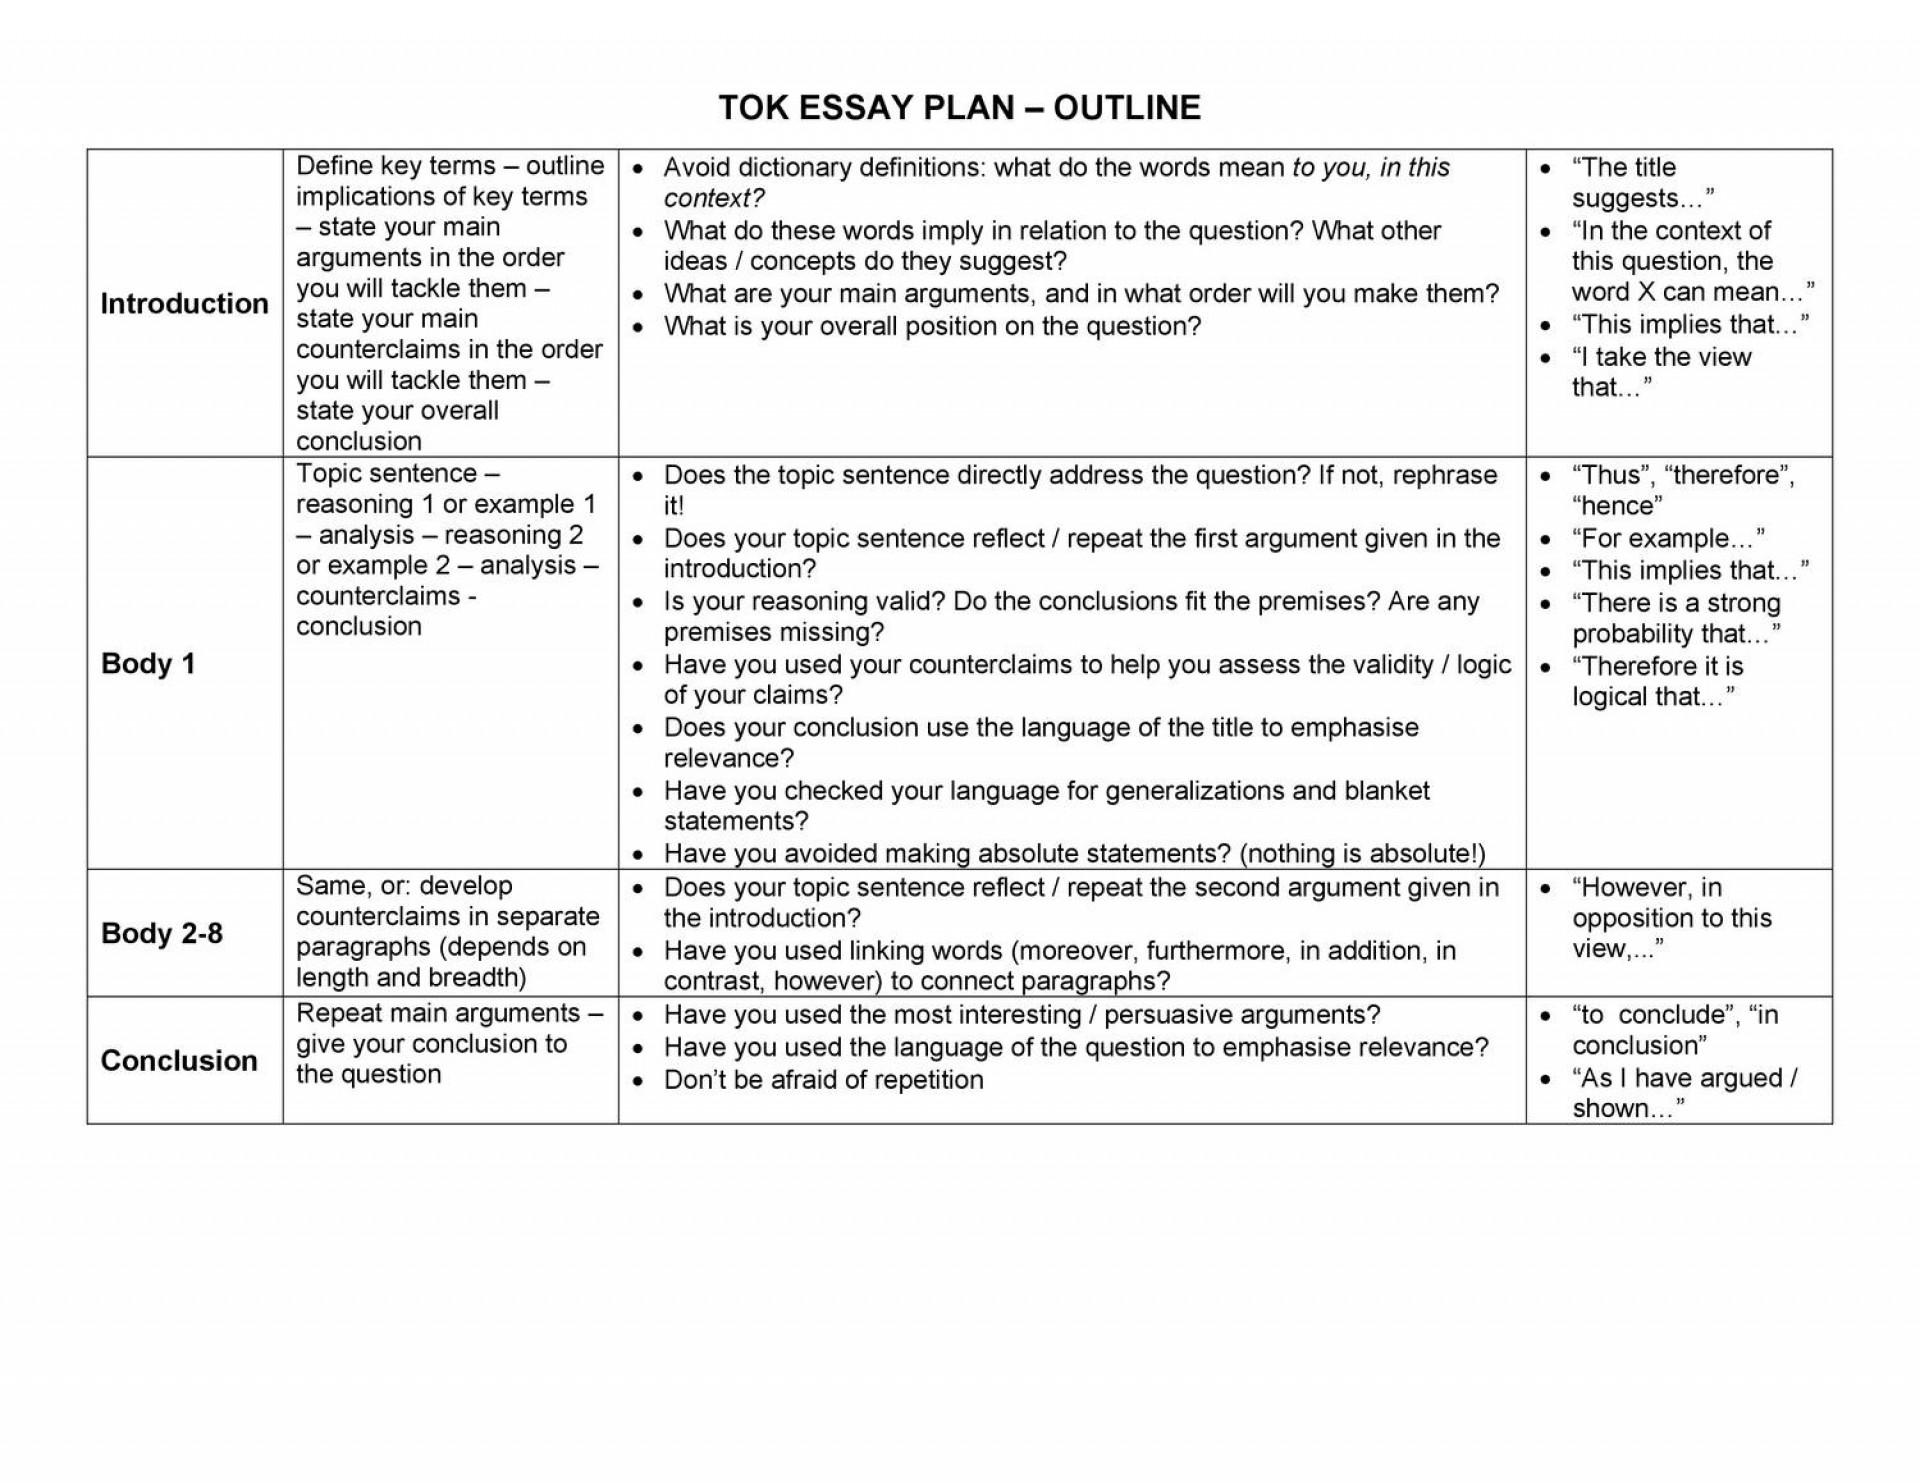 010 Essay Plan Tok Stirring Planning Worksheet Example Template Pdf 1920